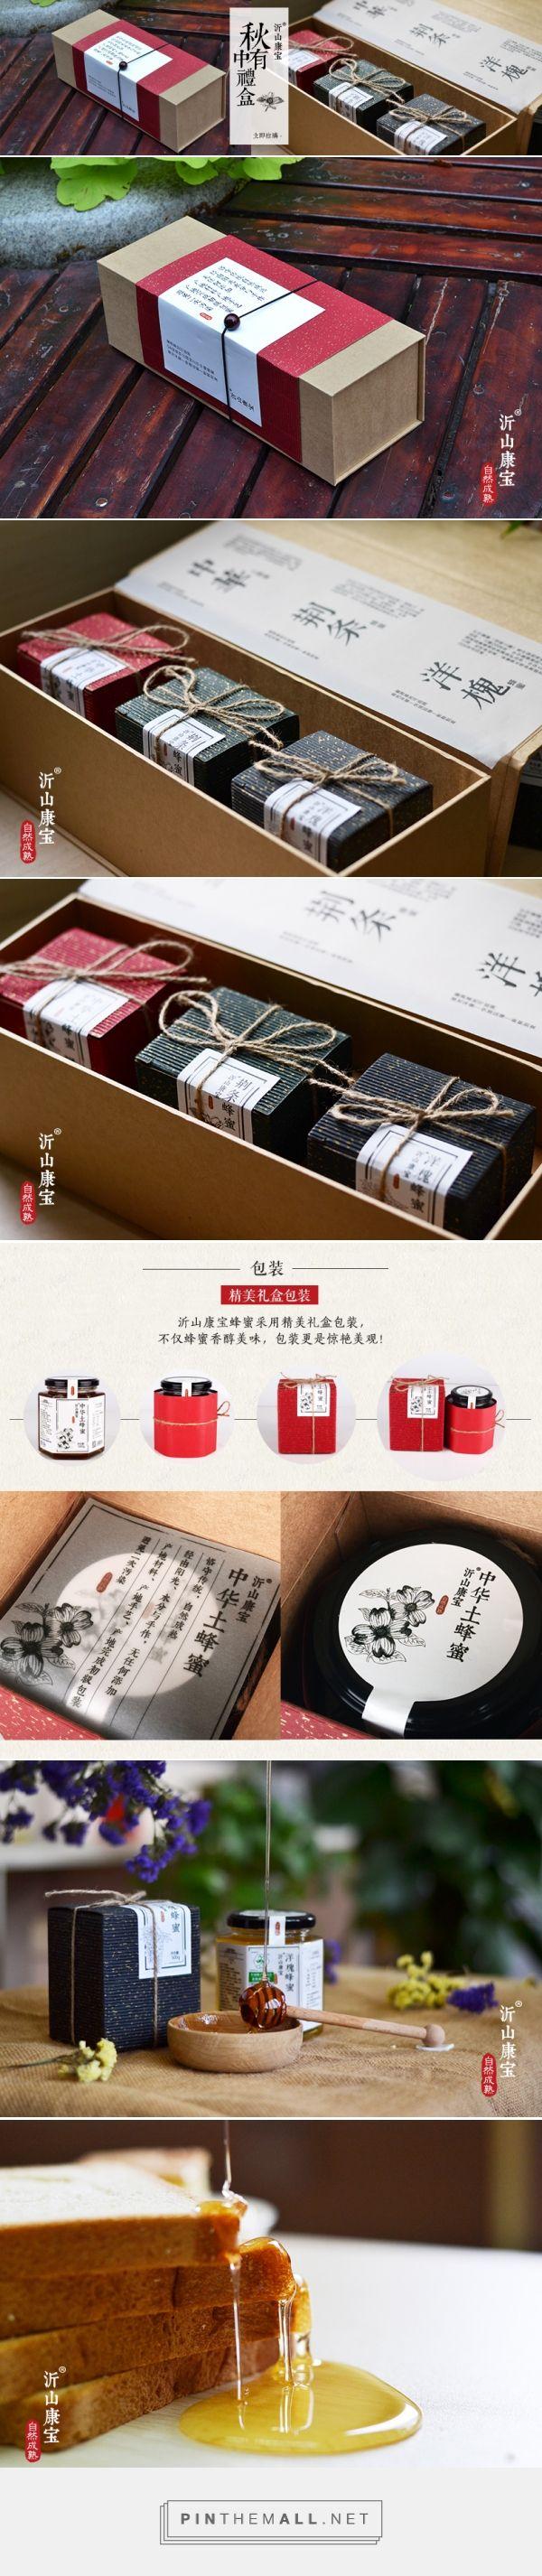 蜂蜜礼盒| 包装 | #Design #Package